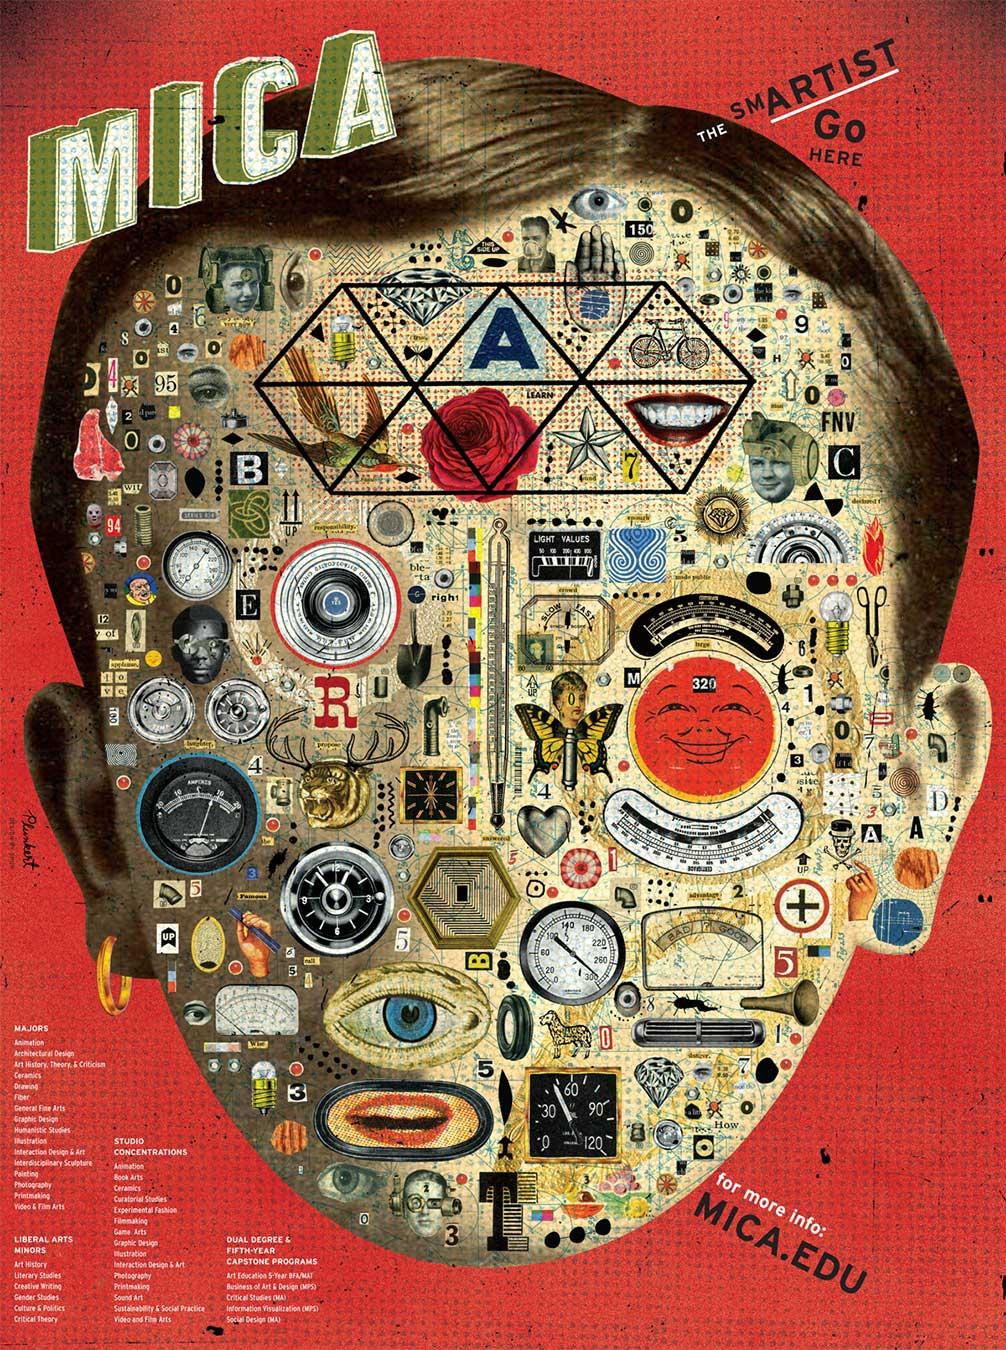 David Plunkert / The Smartest Go Here! / MICA